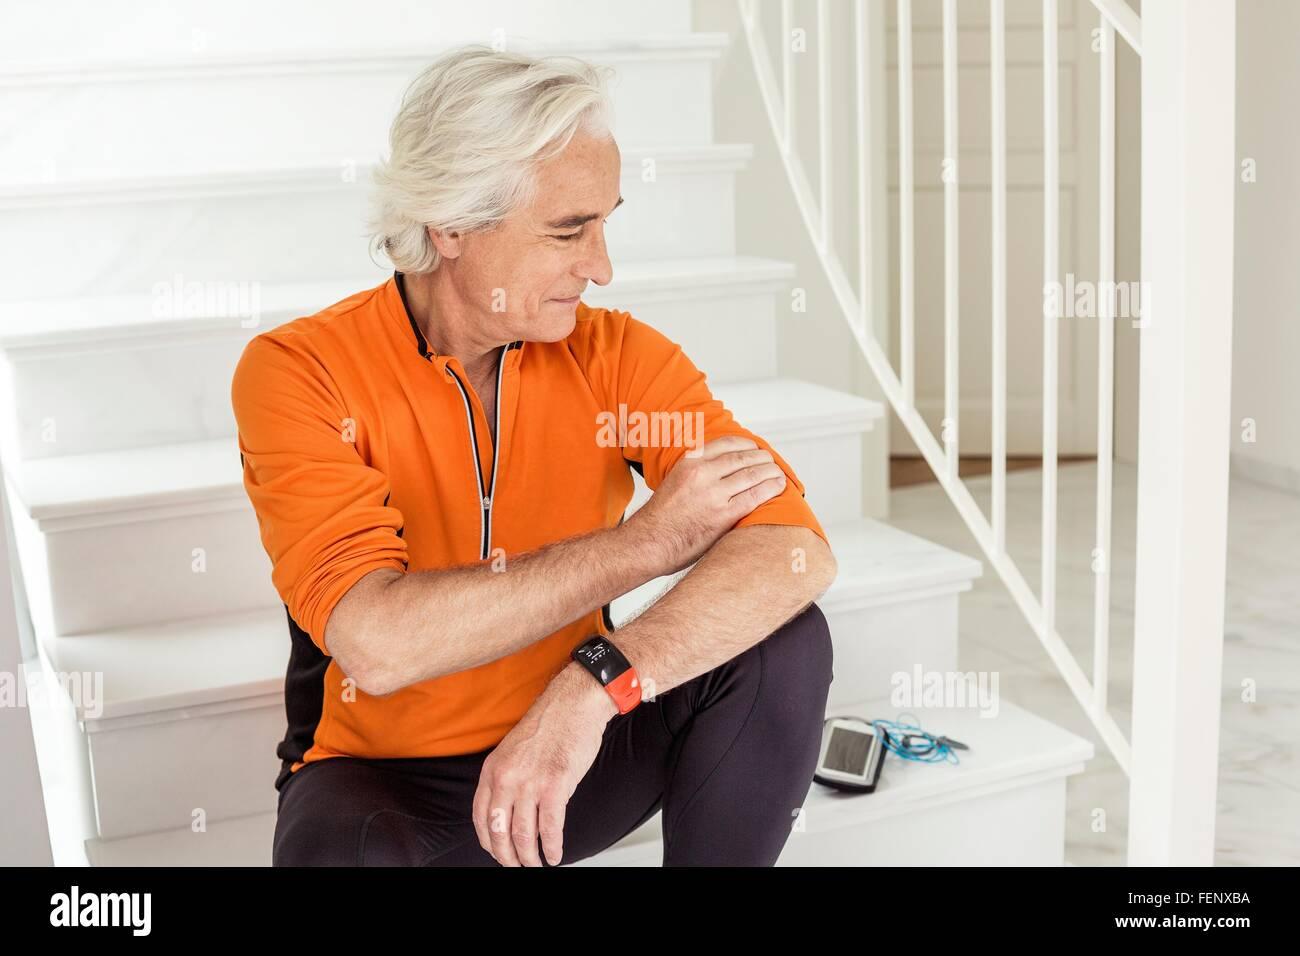 Senior man sitting on staircase preparing for run - Stock Image